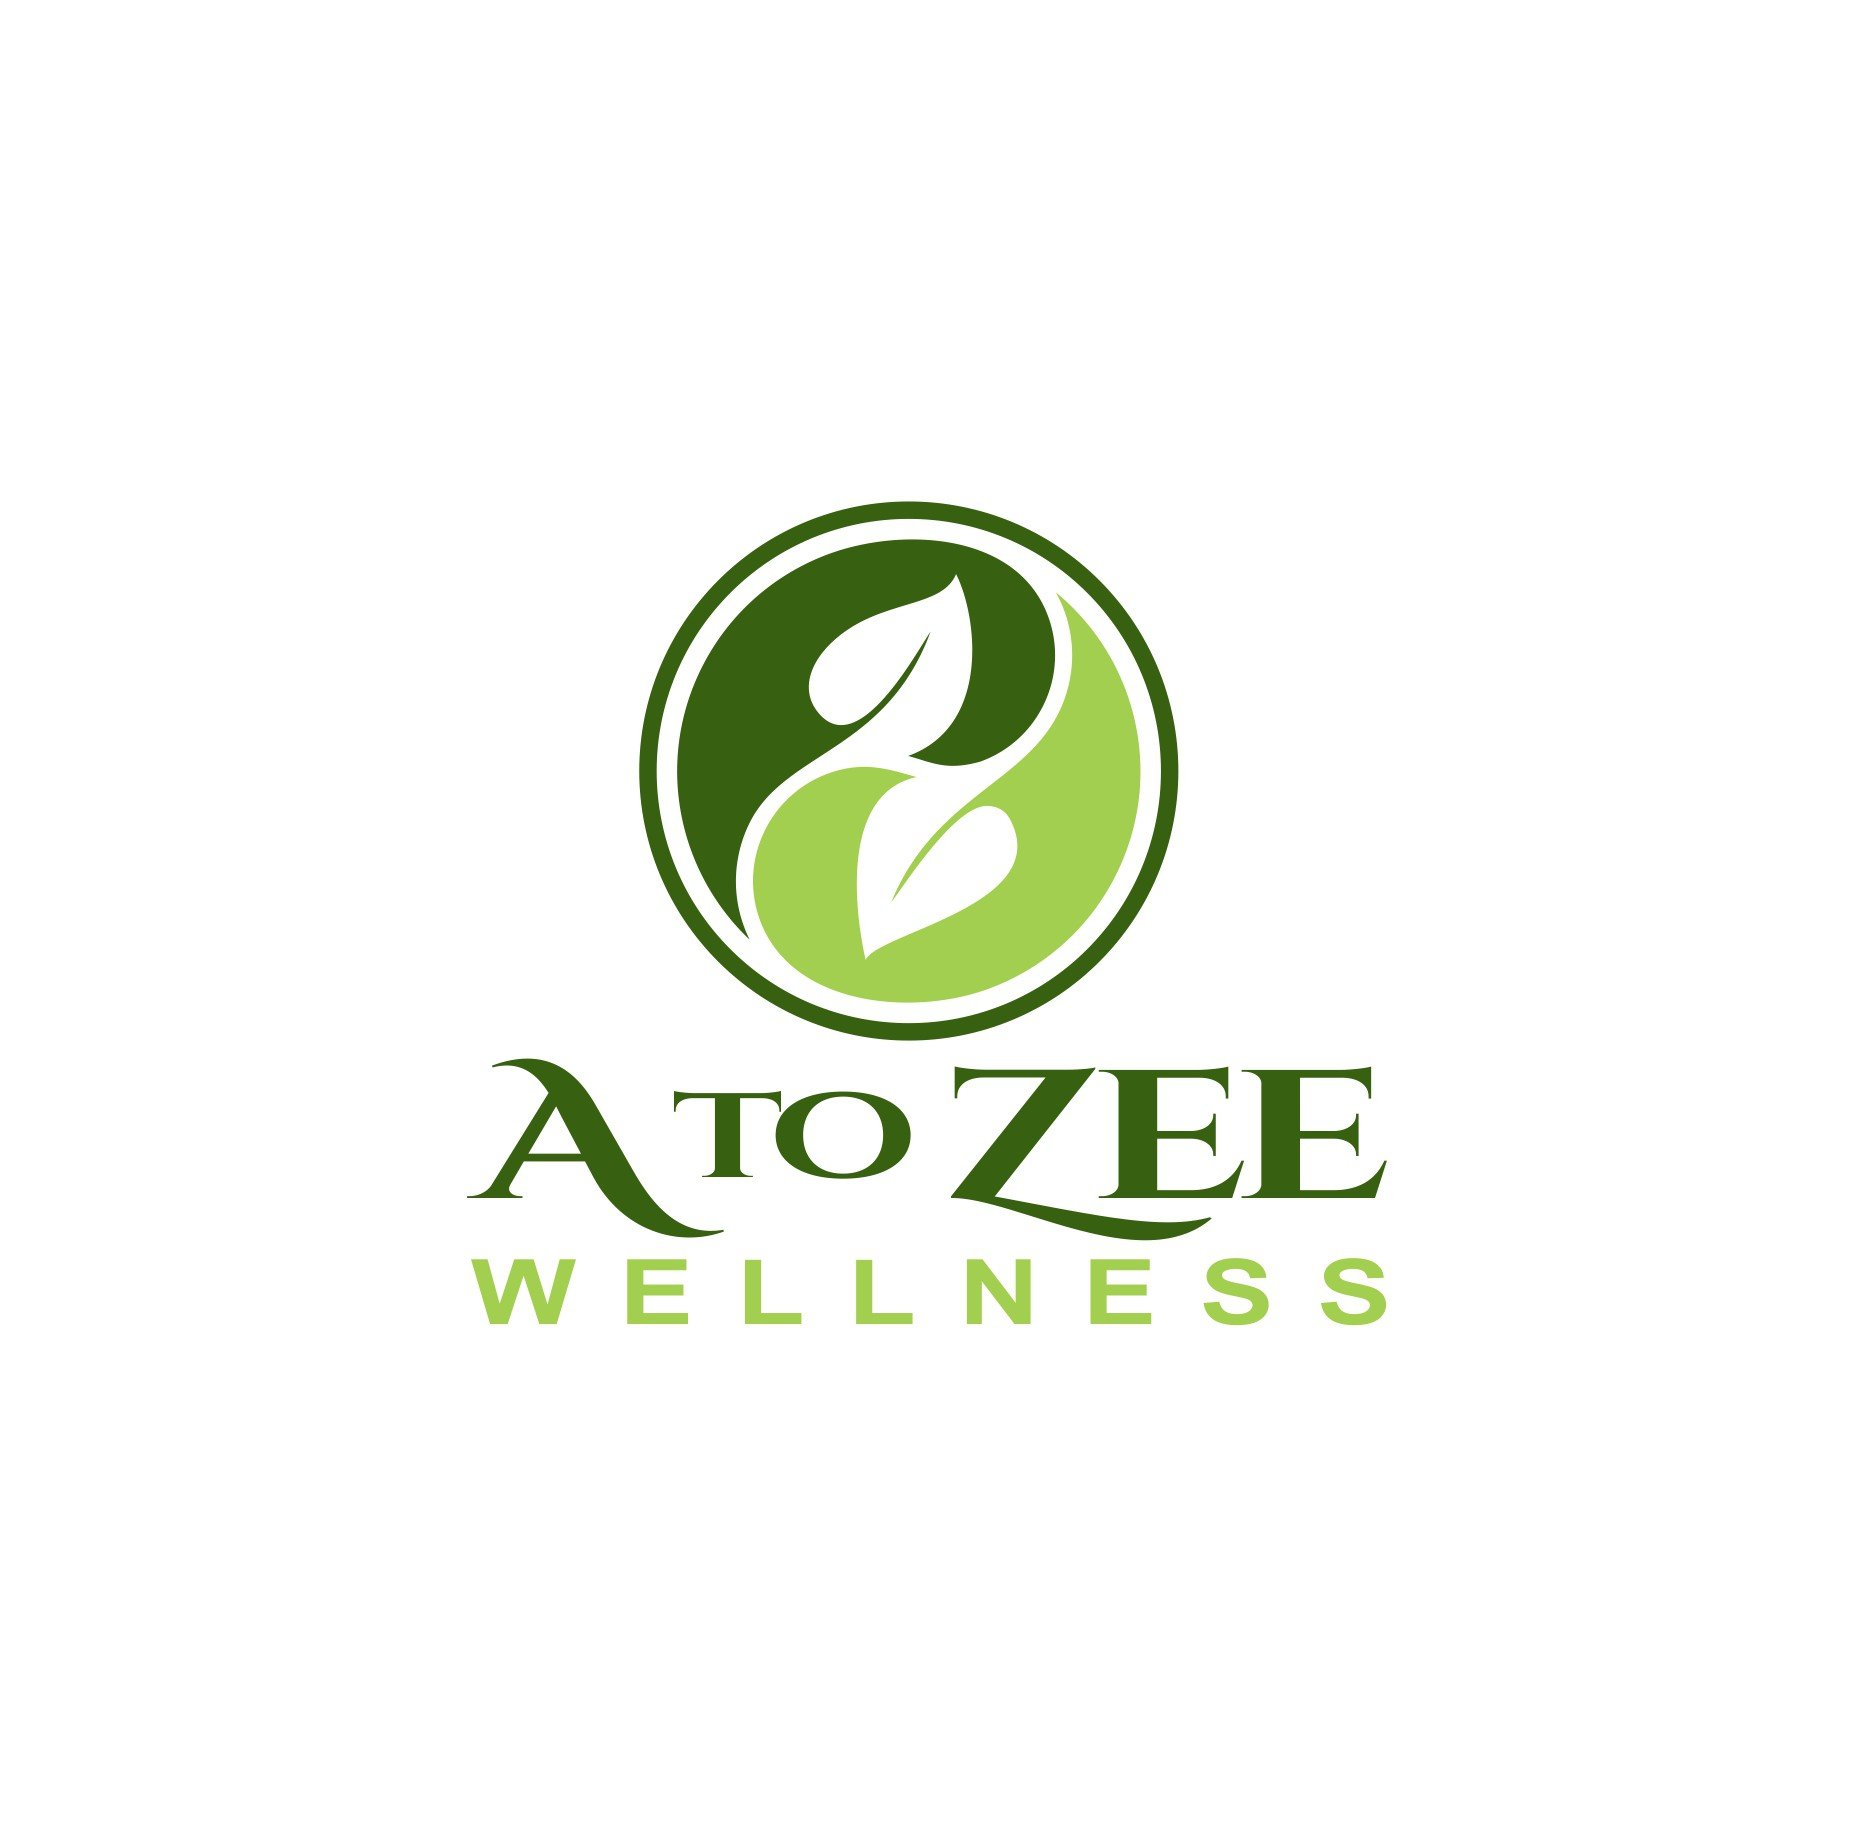 Help Me Grow My Brilliance - organic spring greens logo for health coach / mentor